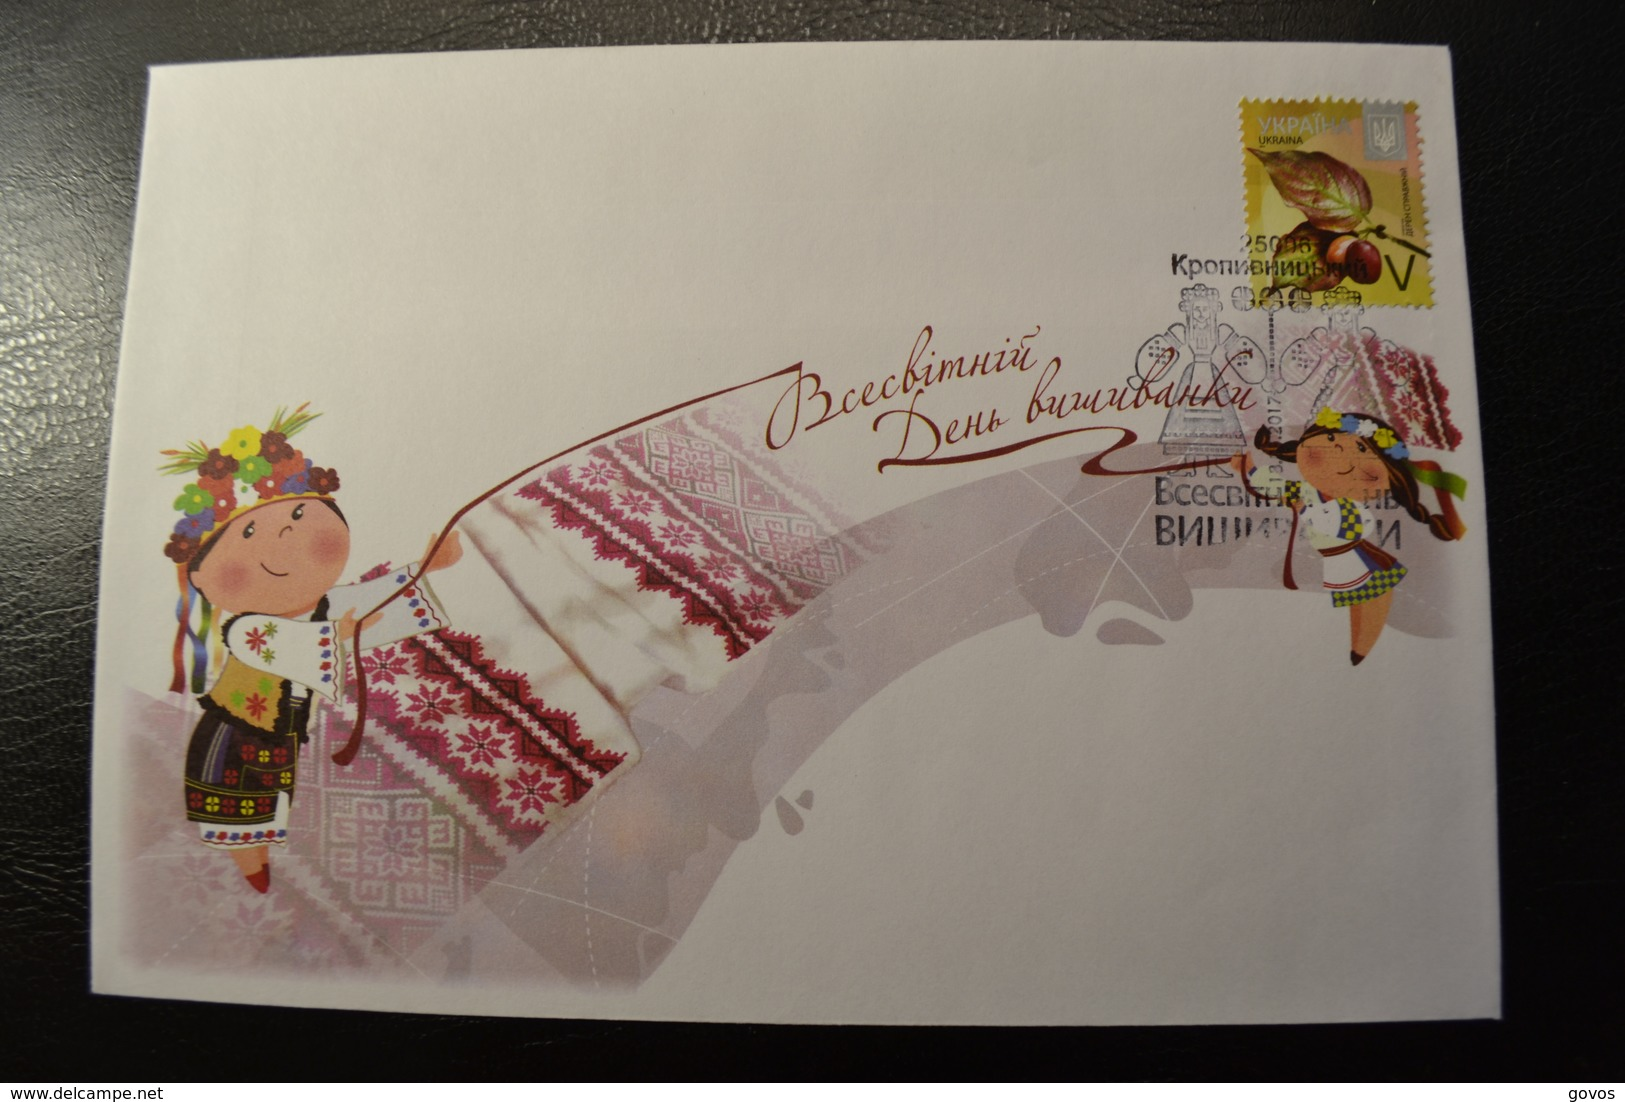 Envelope Special Extinction World Day Of Embroidery In 2017 Kropiwnicki - Ukraine